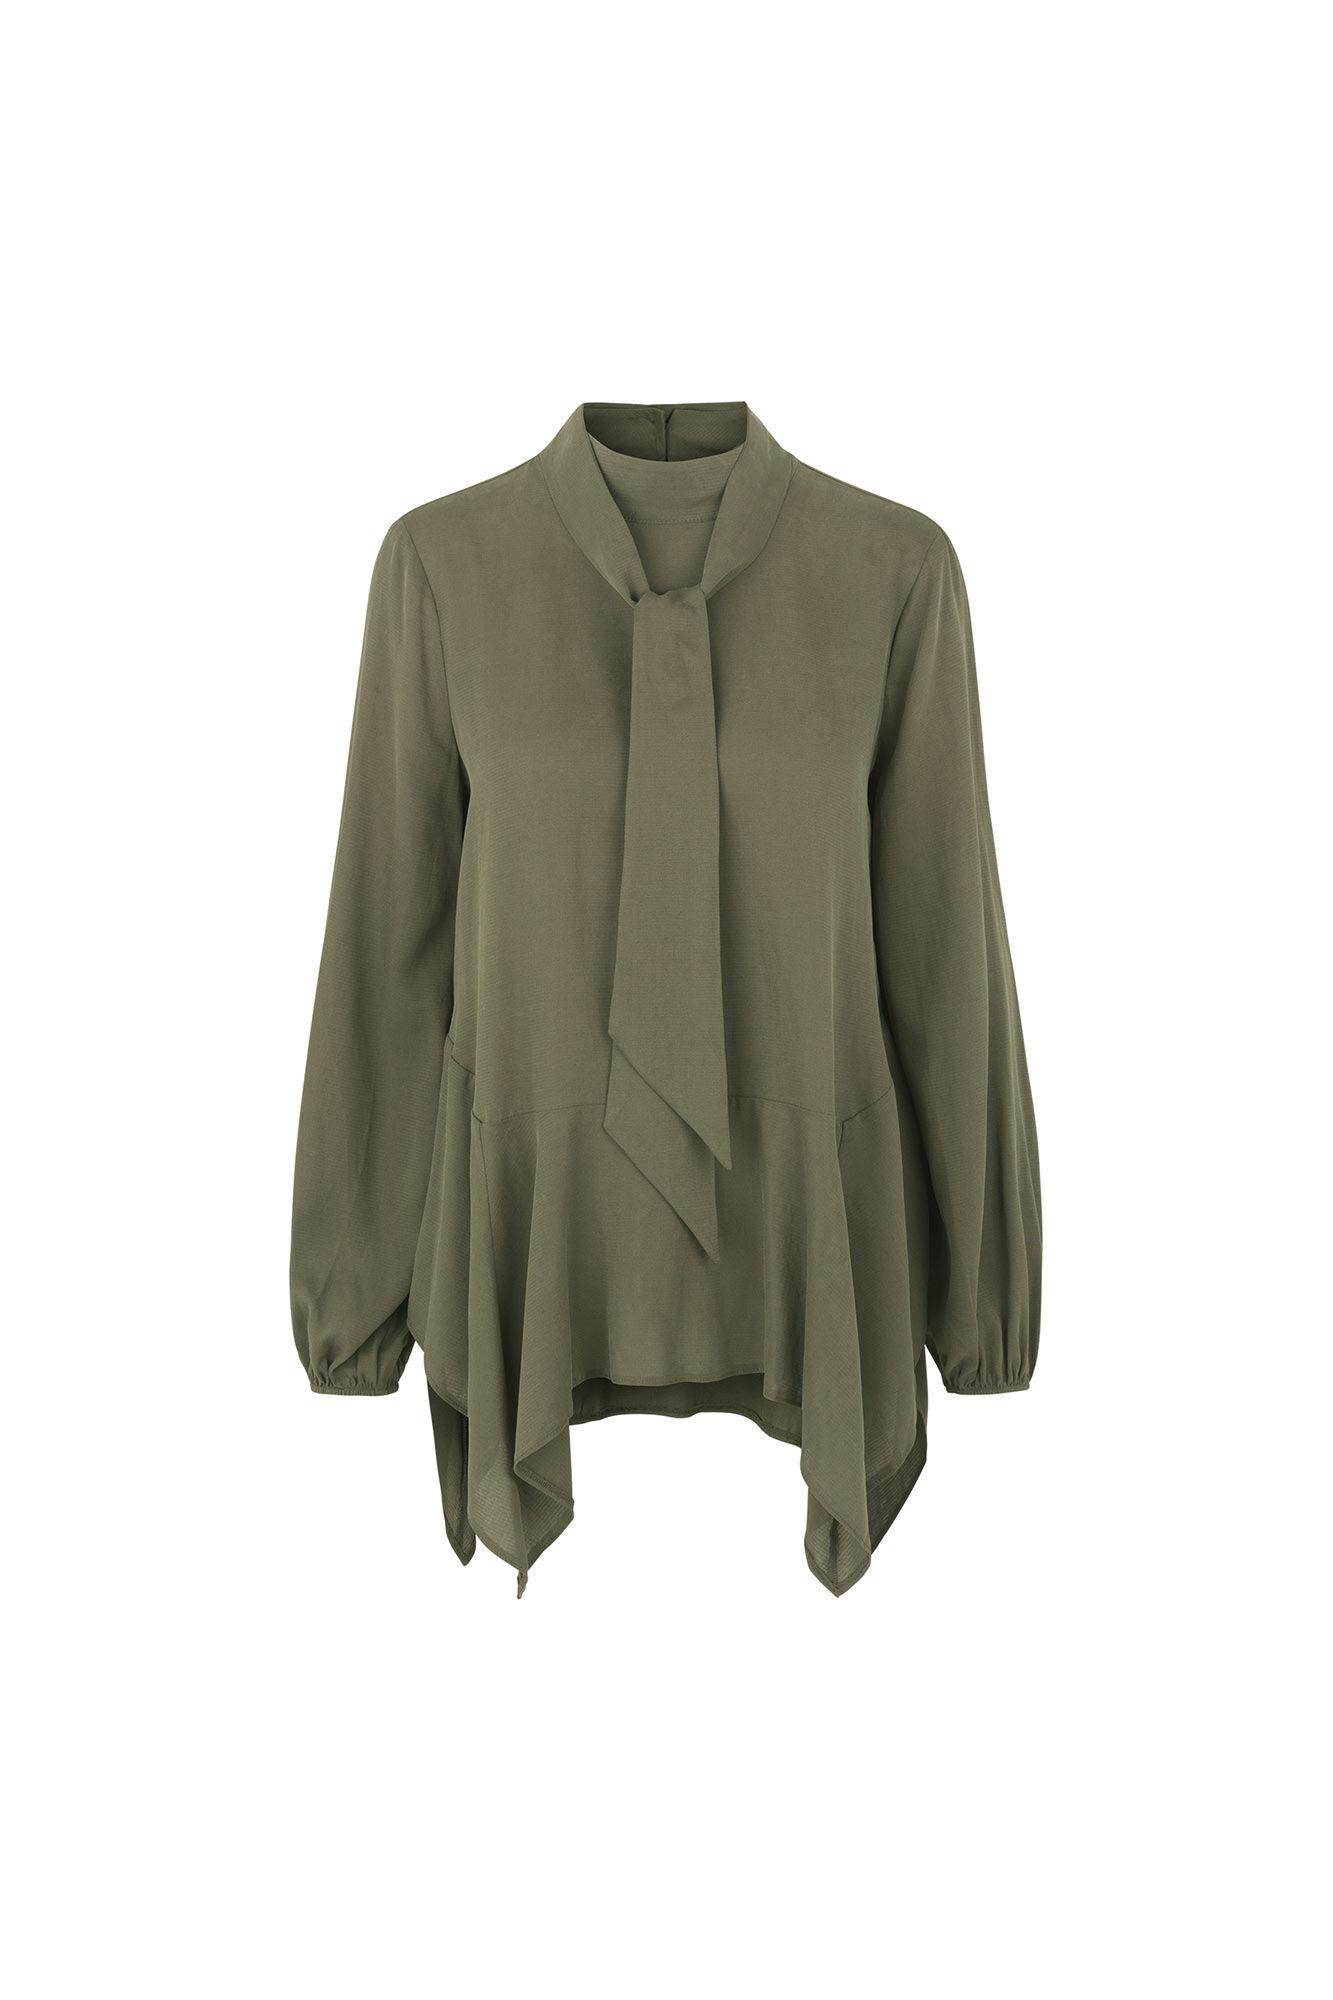 Dianna blouse SM1045, IVY GREEN